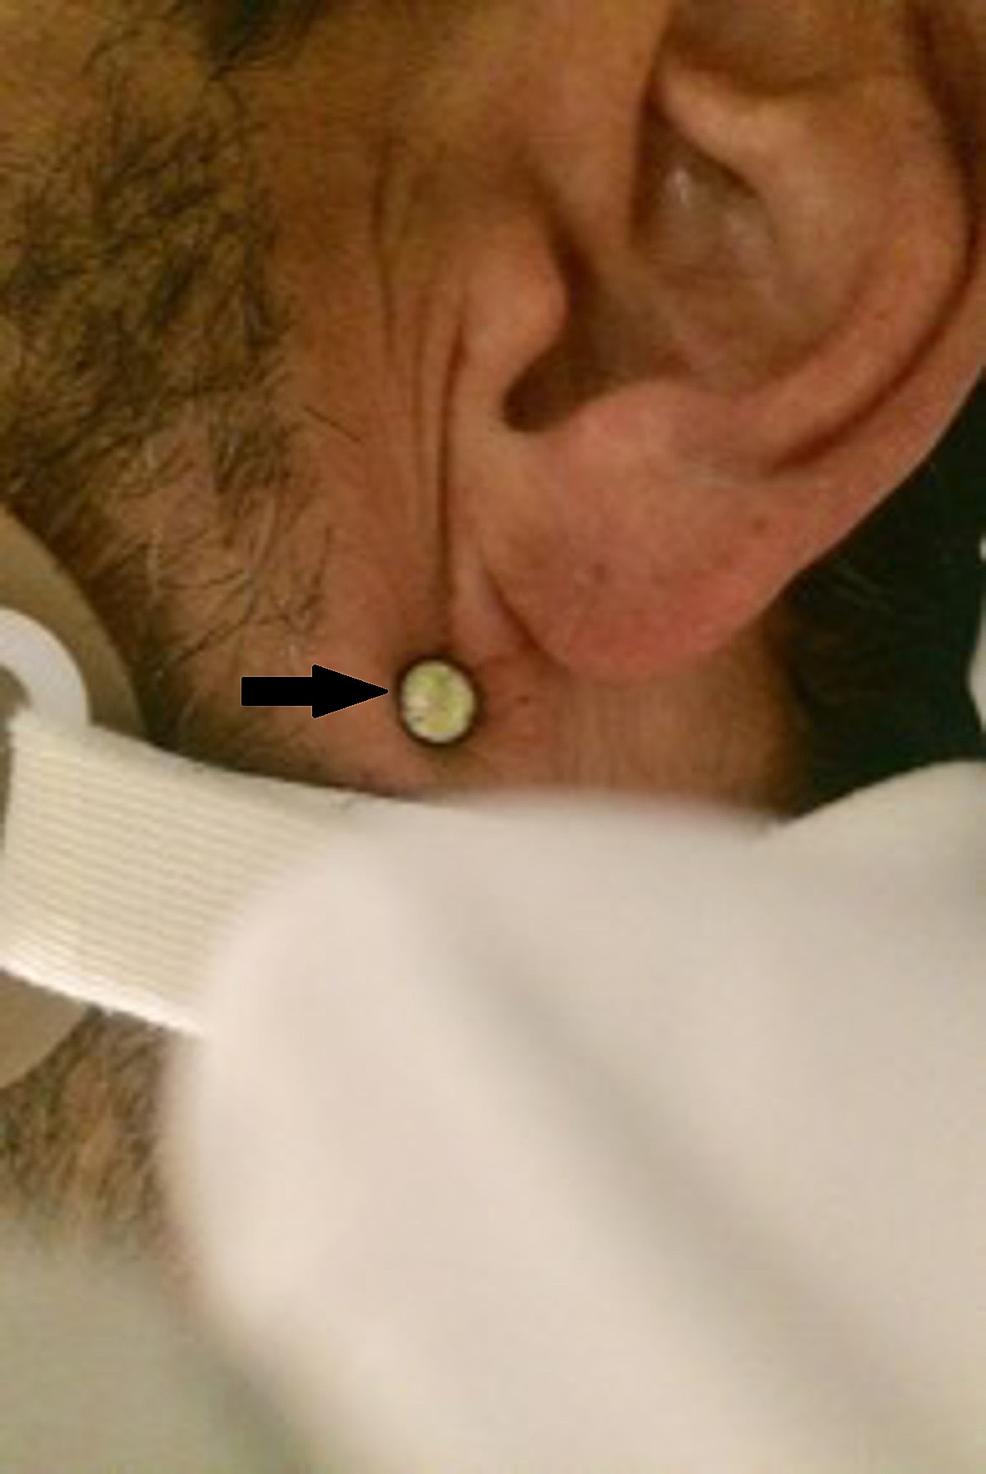 Nail-head-visible-in-the-left-retromandibular-region---neck-zone-3-injury